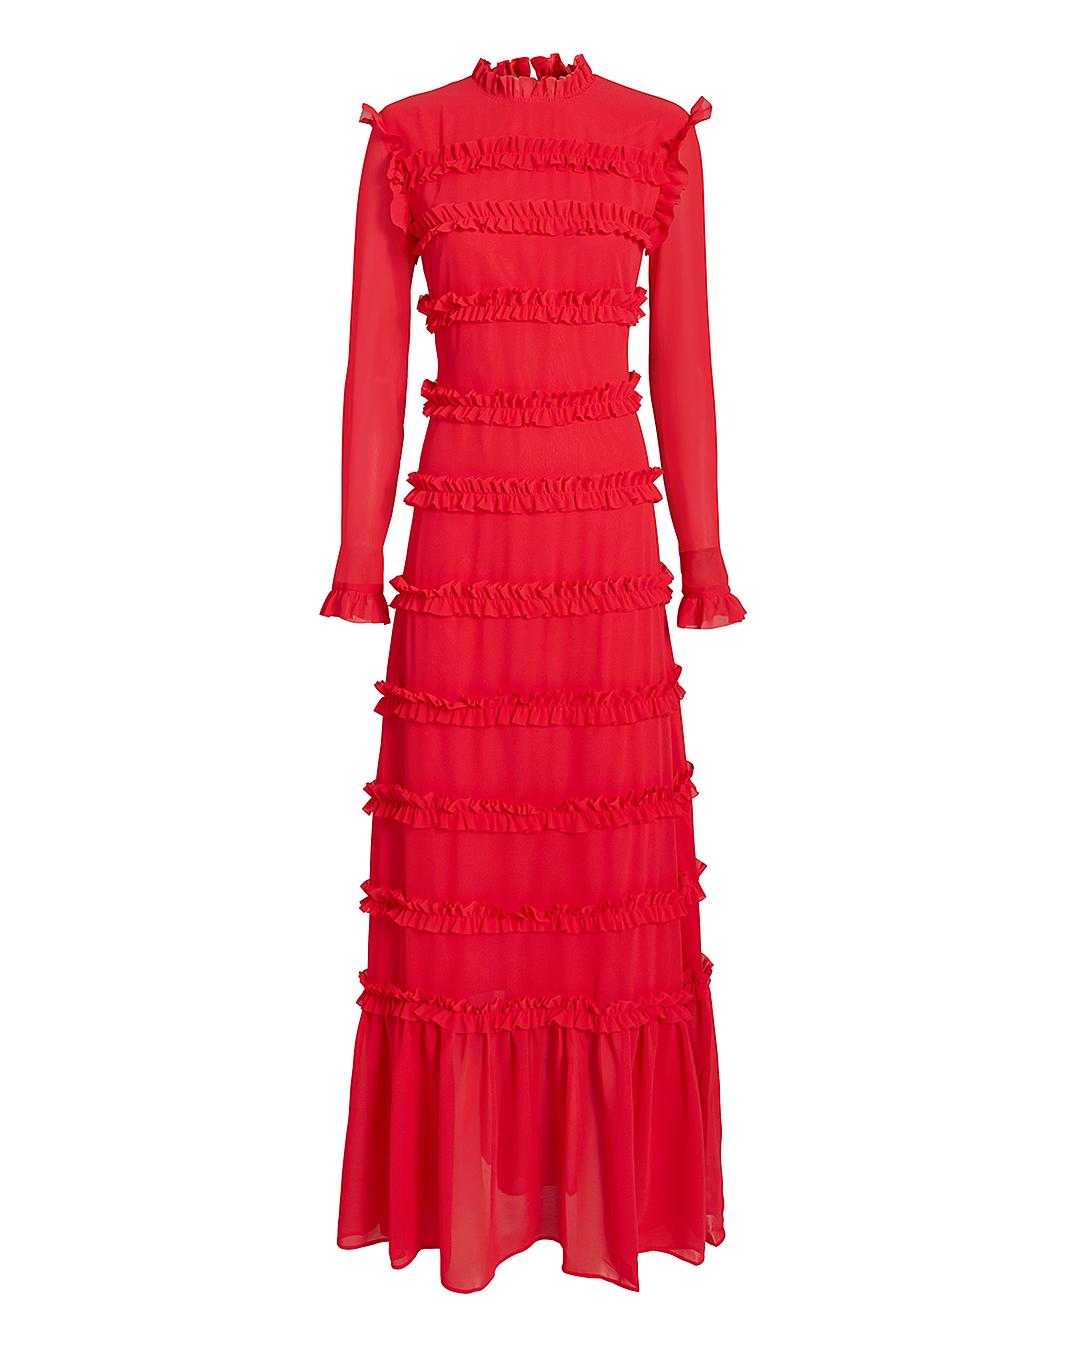 Hadley Ruffle-Trimmed Maxi Dress, Red